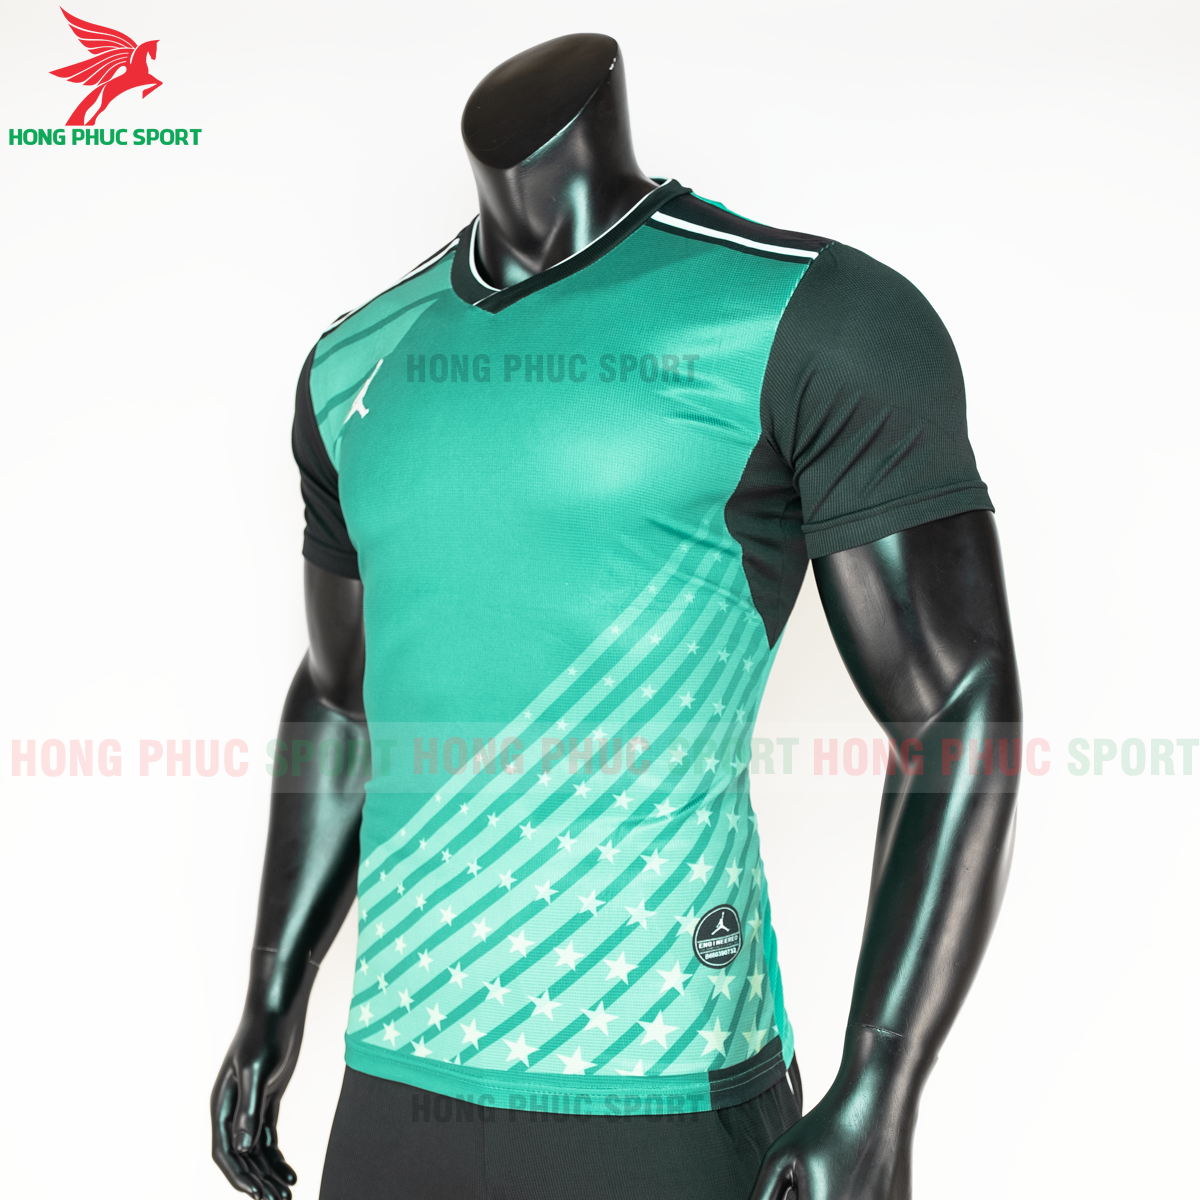 https://cdn.hongphucsport.com/unsafe/s4.shopbay.vn/files/285/ao-bong-chuyen-jordan-20-21-hang-det-mau3-3-5faf43bd1fb51.png